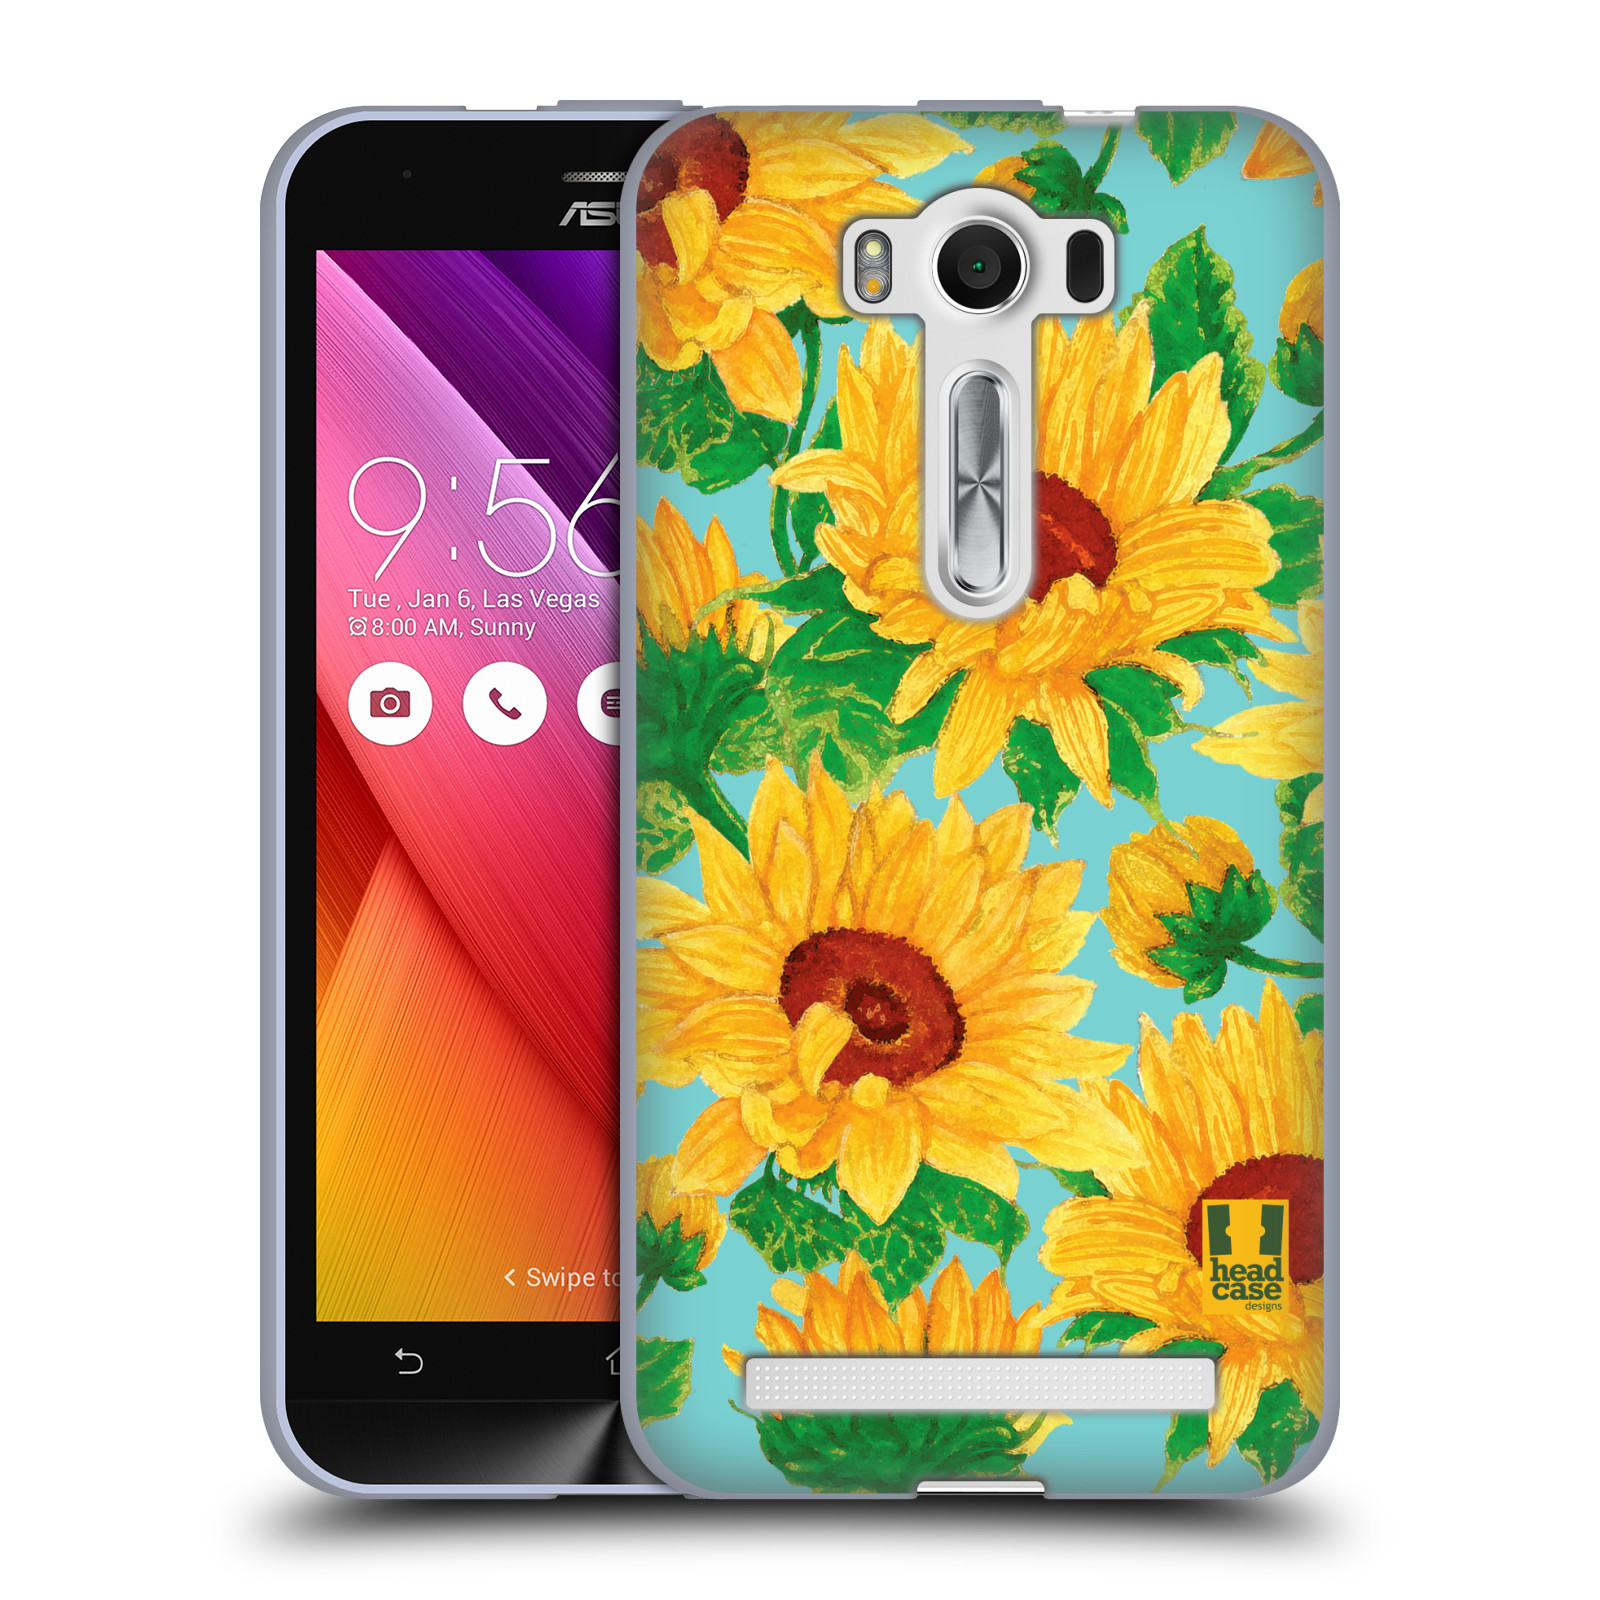 "Silikonové pouzdro na mobil Asus ZenFone 2 Laser ZE500KL HEAD CASE Slunečnice (Silikonový kryt či obal na mobilní telefon Asus ZenFone 2 Laser ZE500KL s 5"" displejem)"